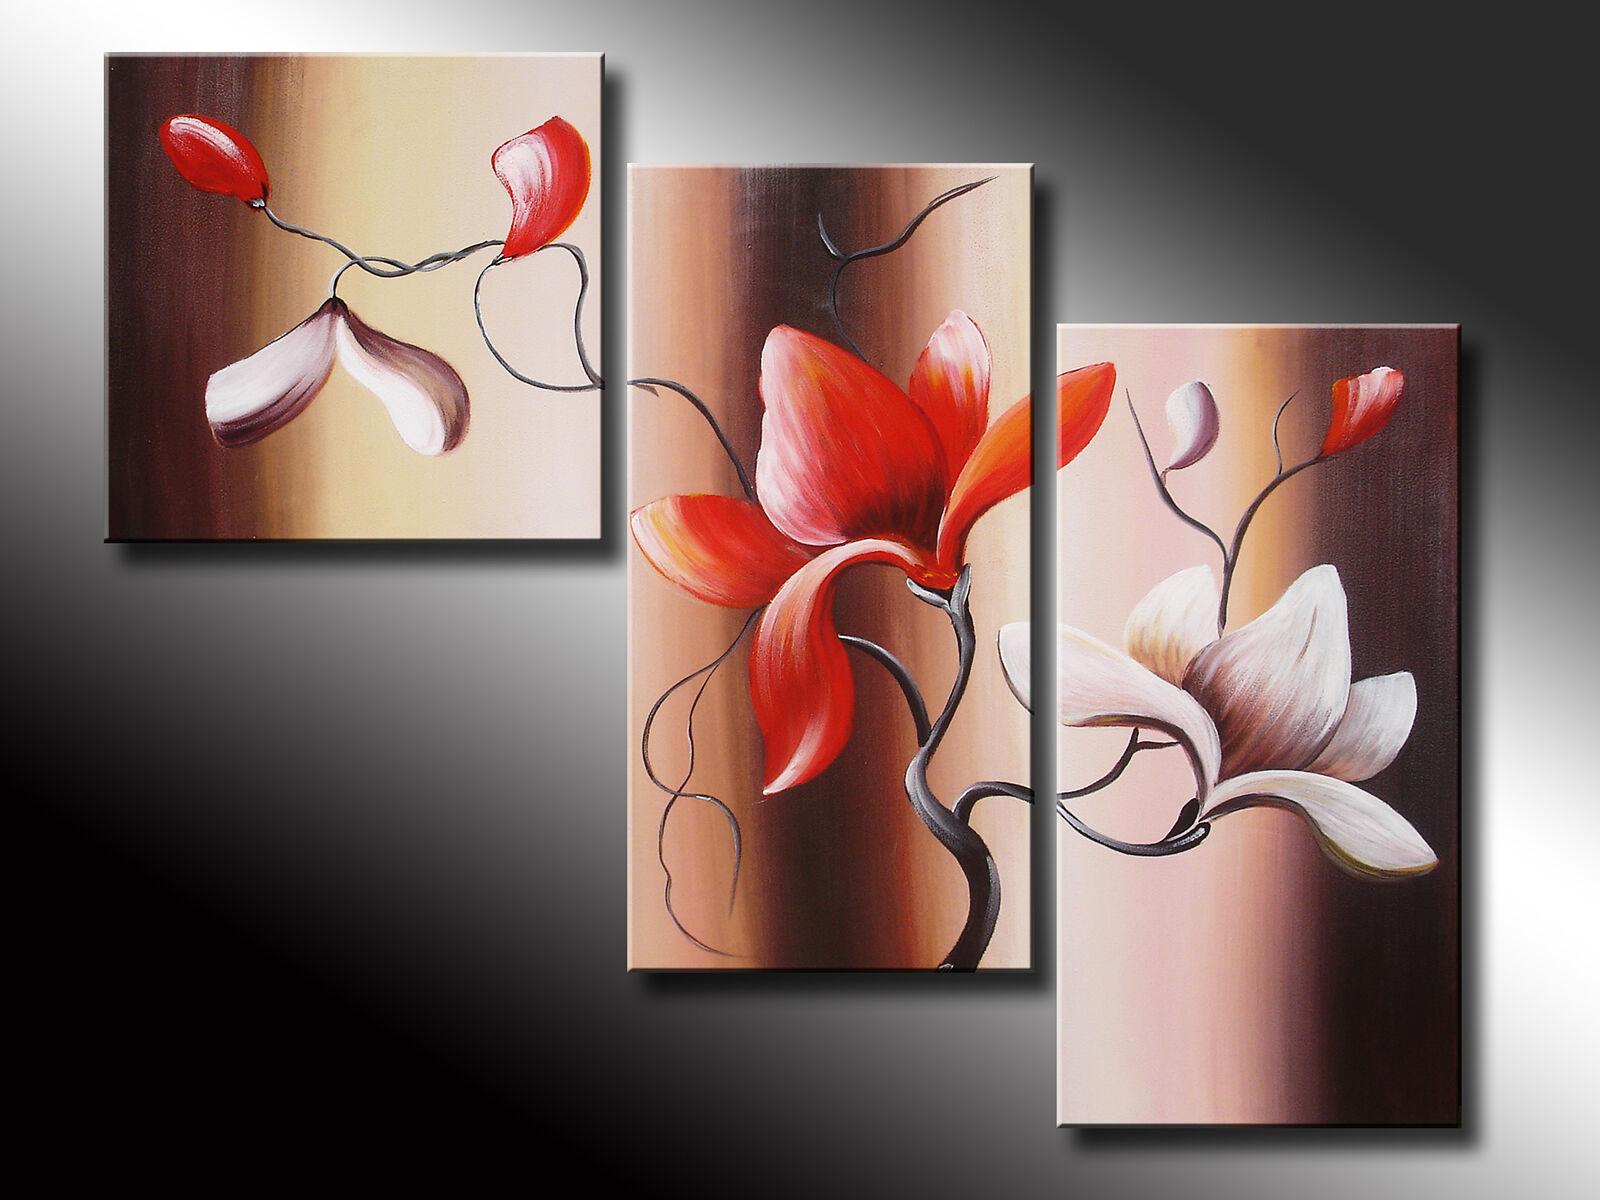 Modern Abstract Huge Art Oil Painting Wall Decor 3piece